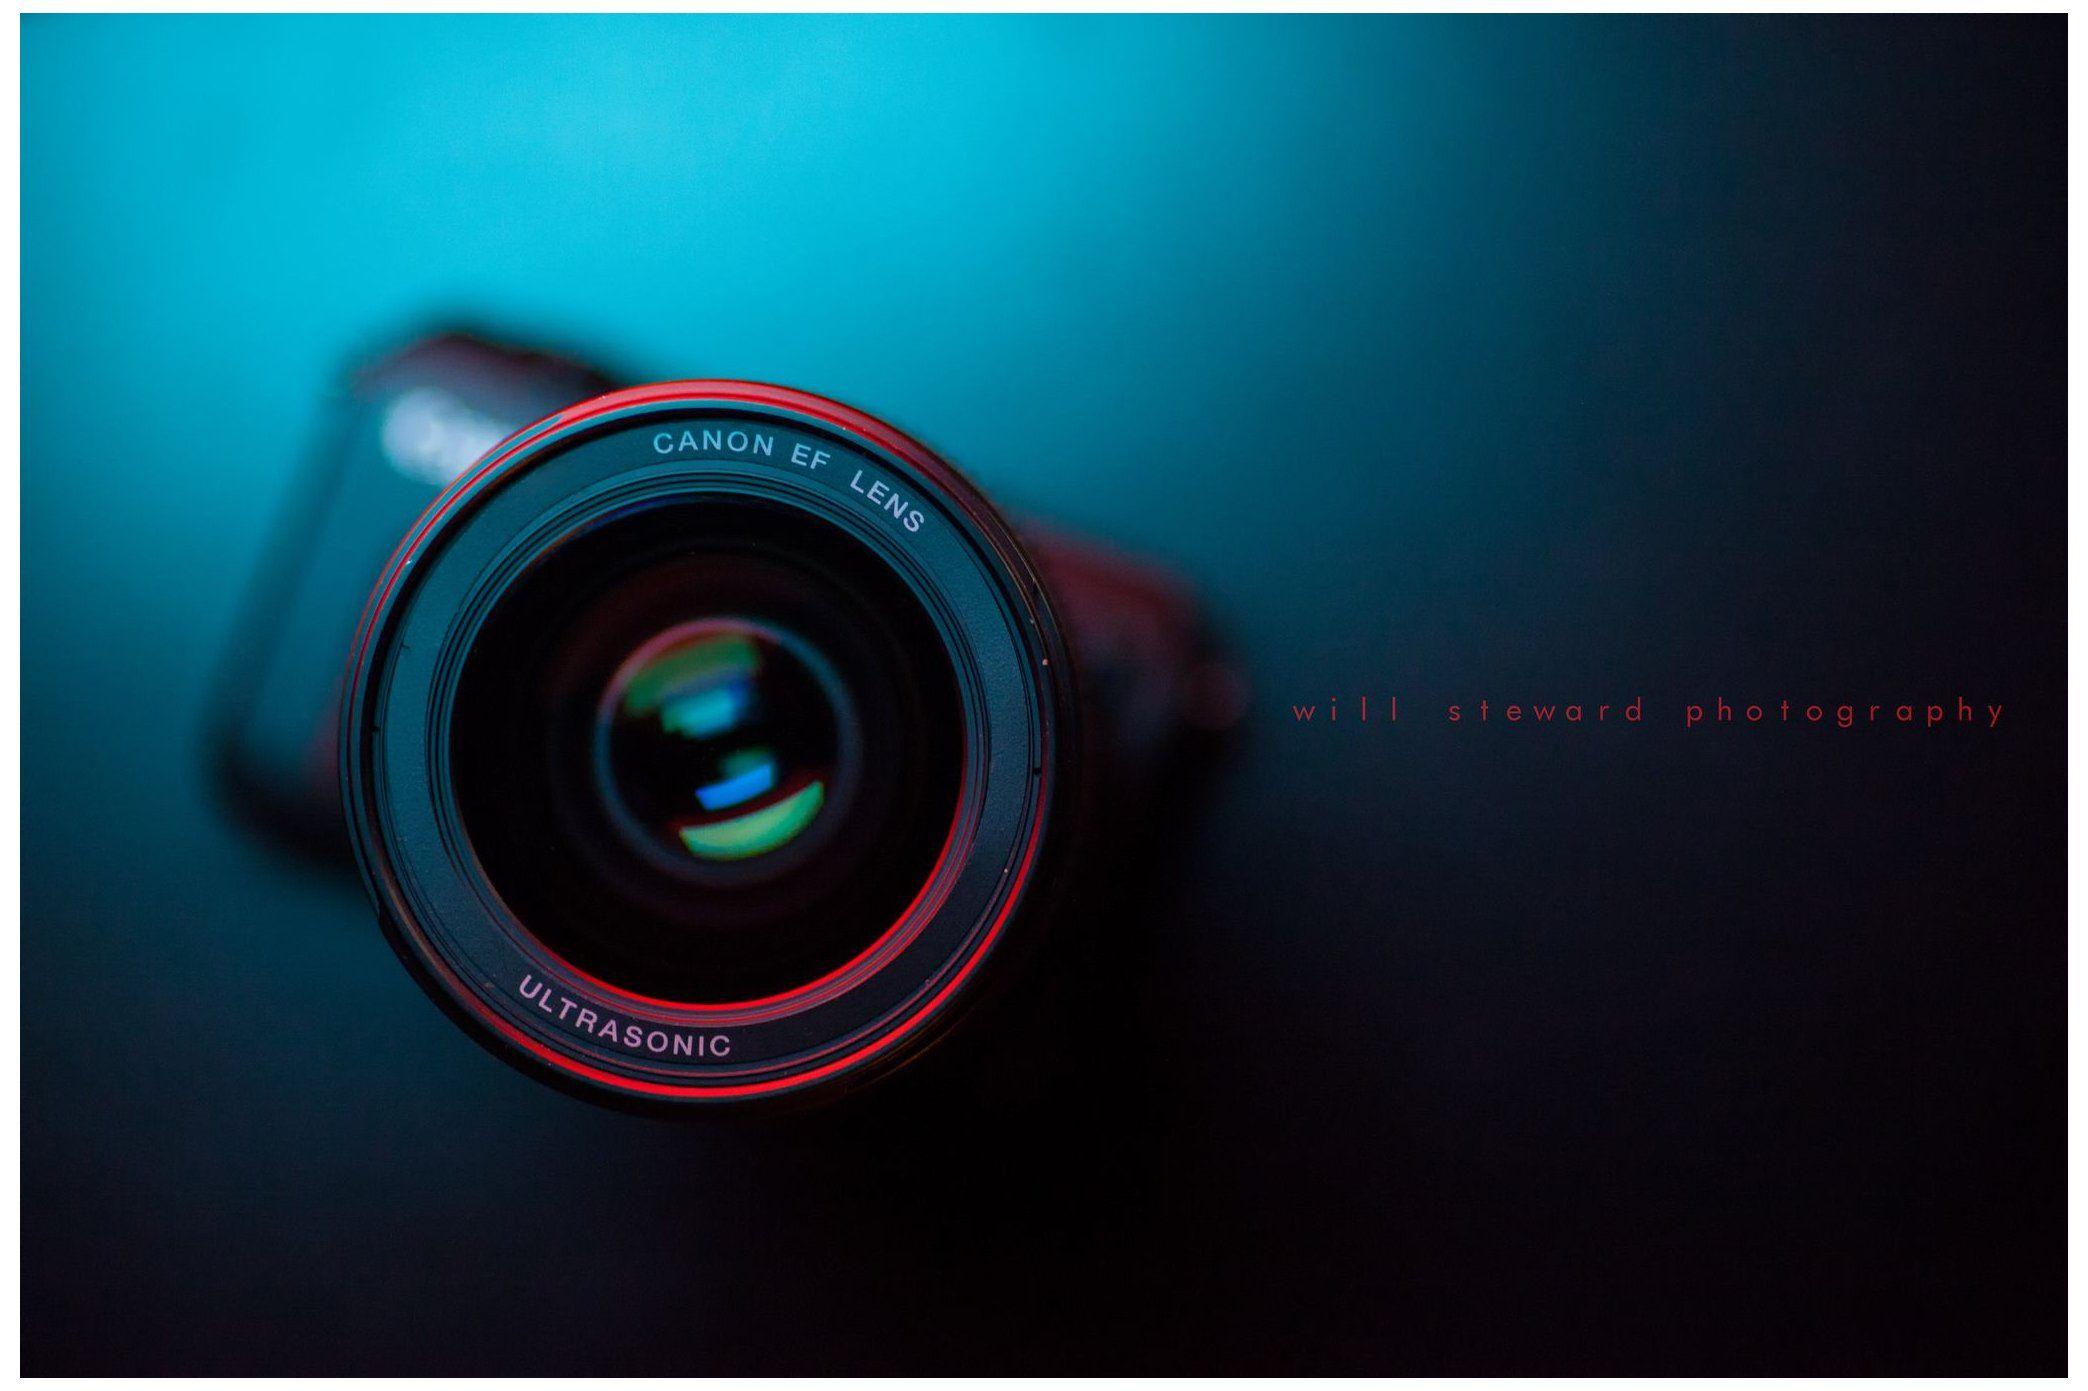 Canon Camera Wallpaper Hd Canoncamerawallpaperhd In 2021 Camera Wallpaper Photography Camera Iphone Camera Lens